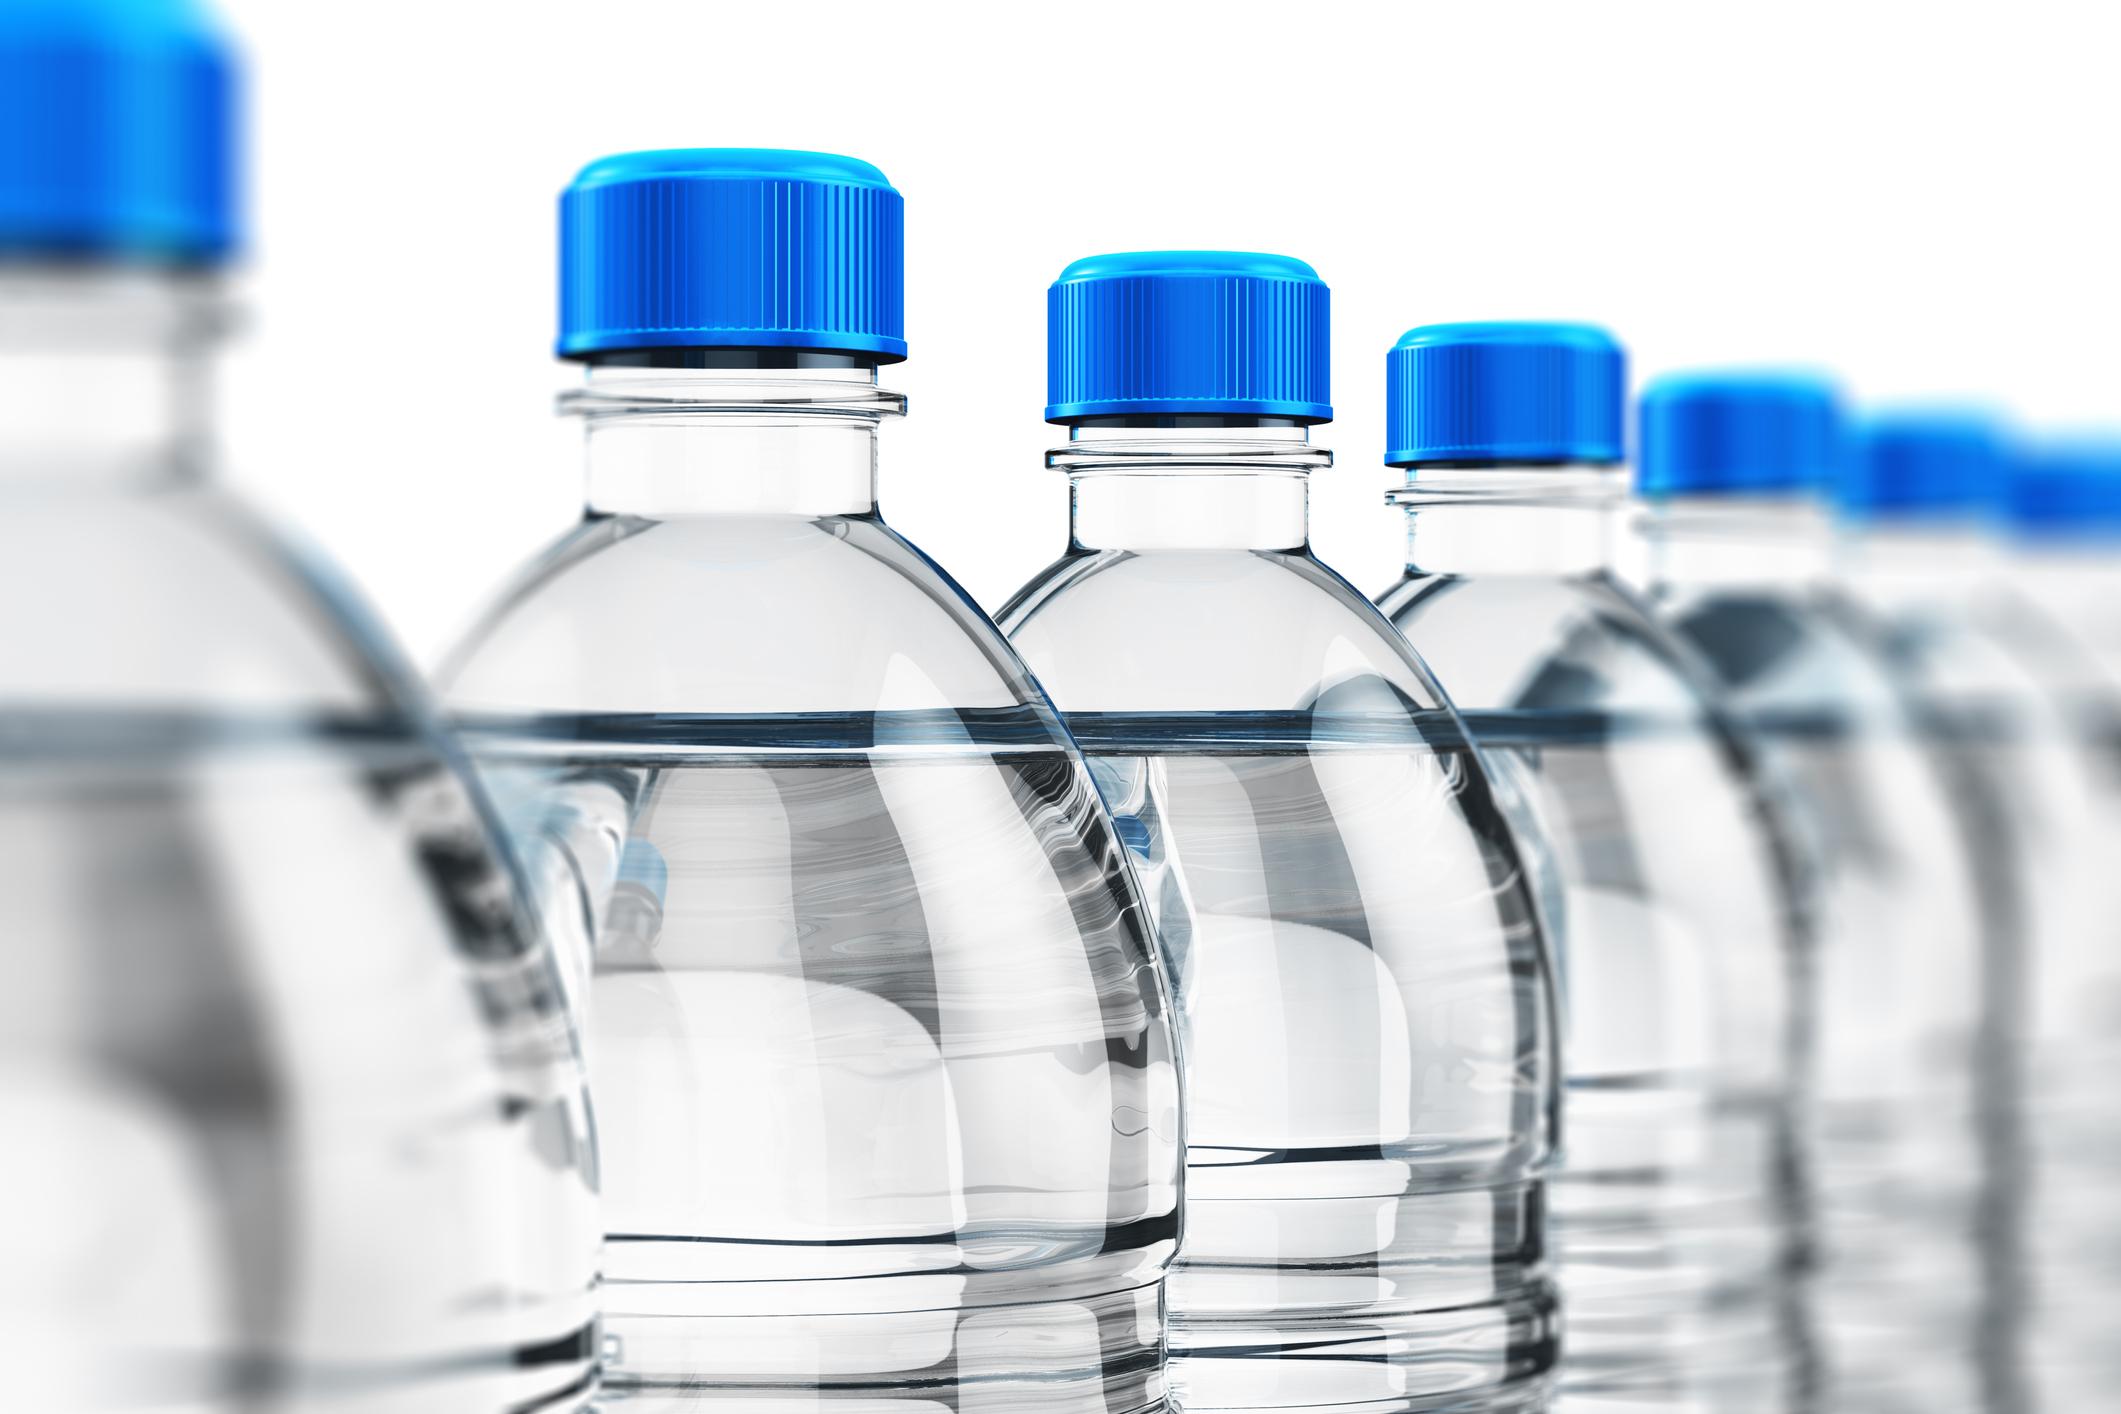 Row of plastic drink water bottles